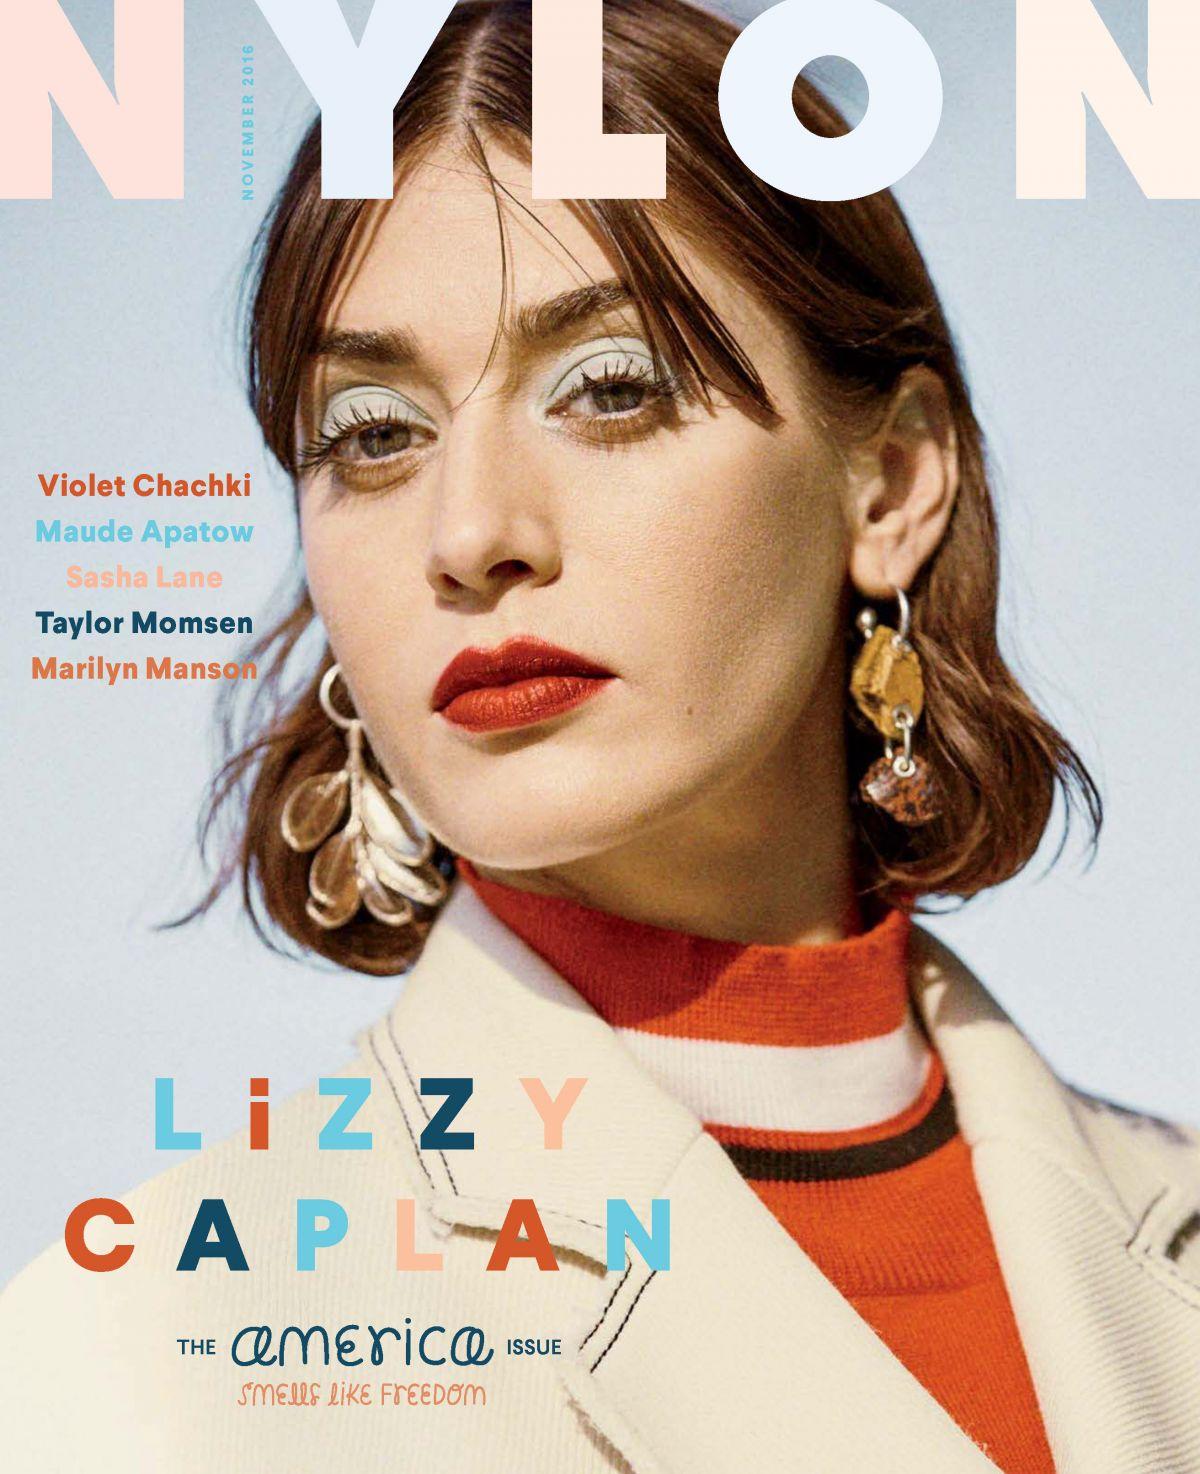 LIZZY CAPLAN in Nylon Magazine, November 2016 Issue